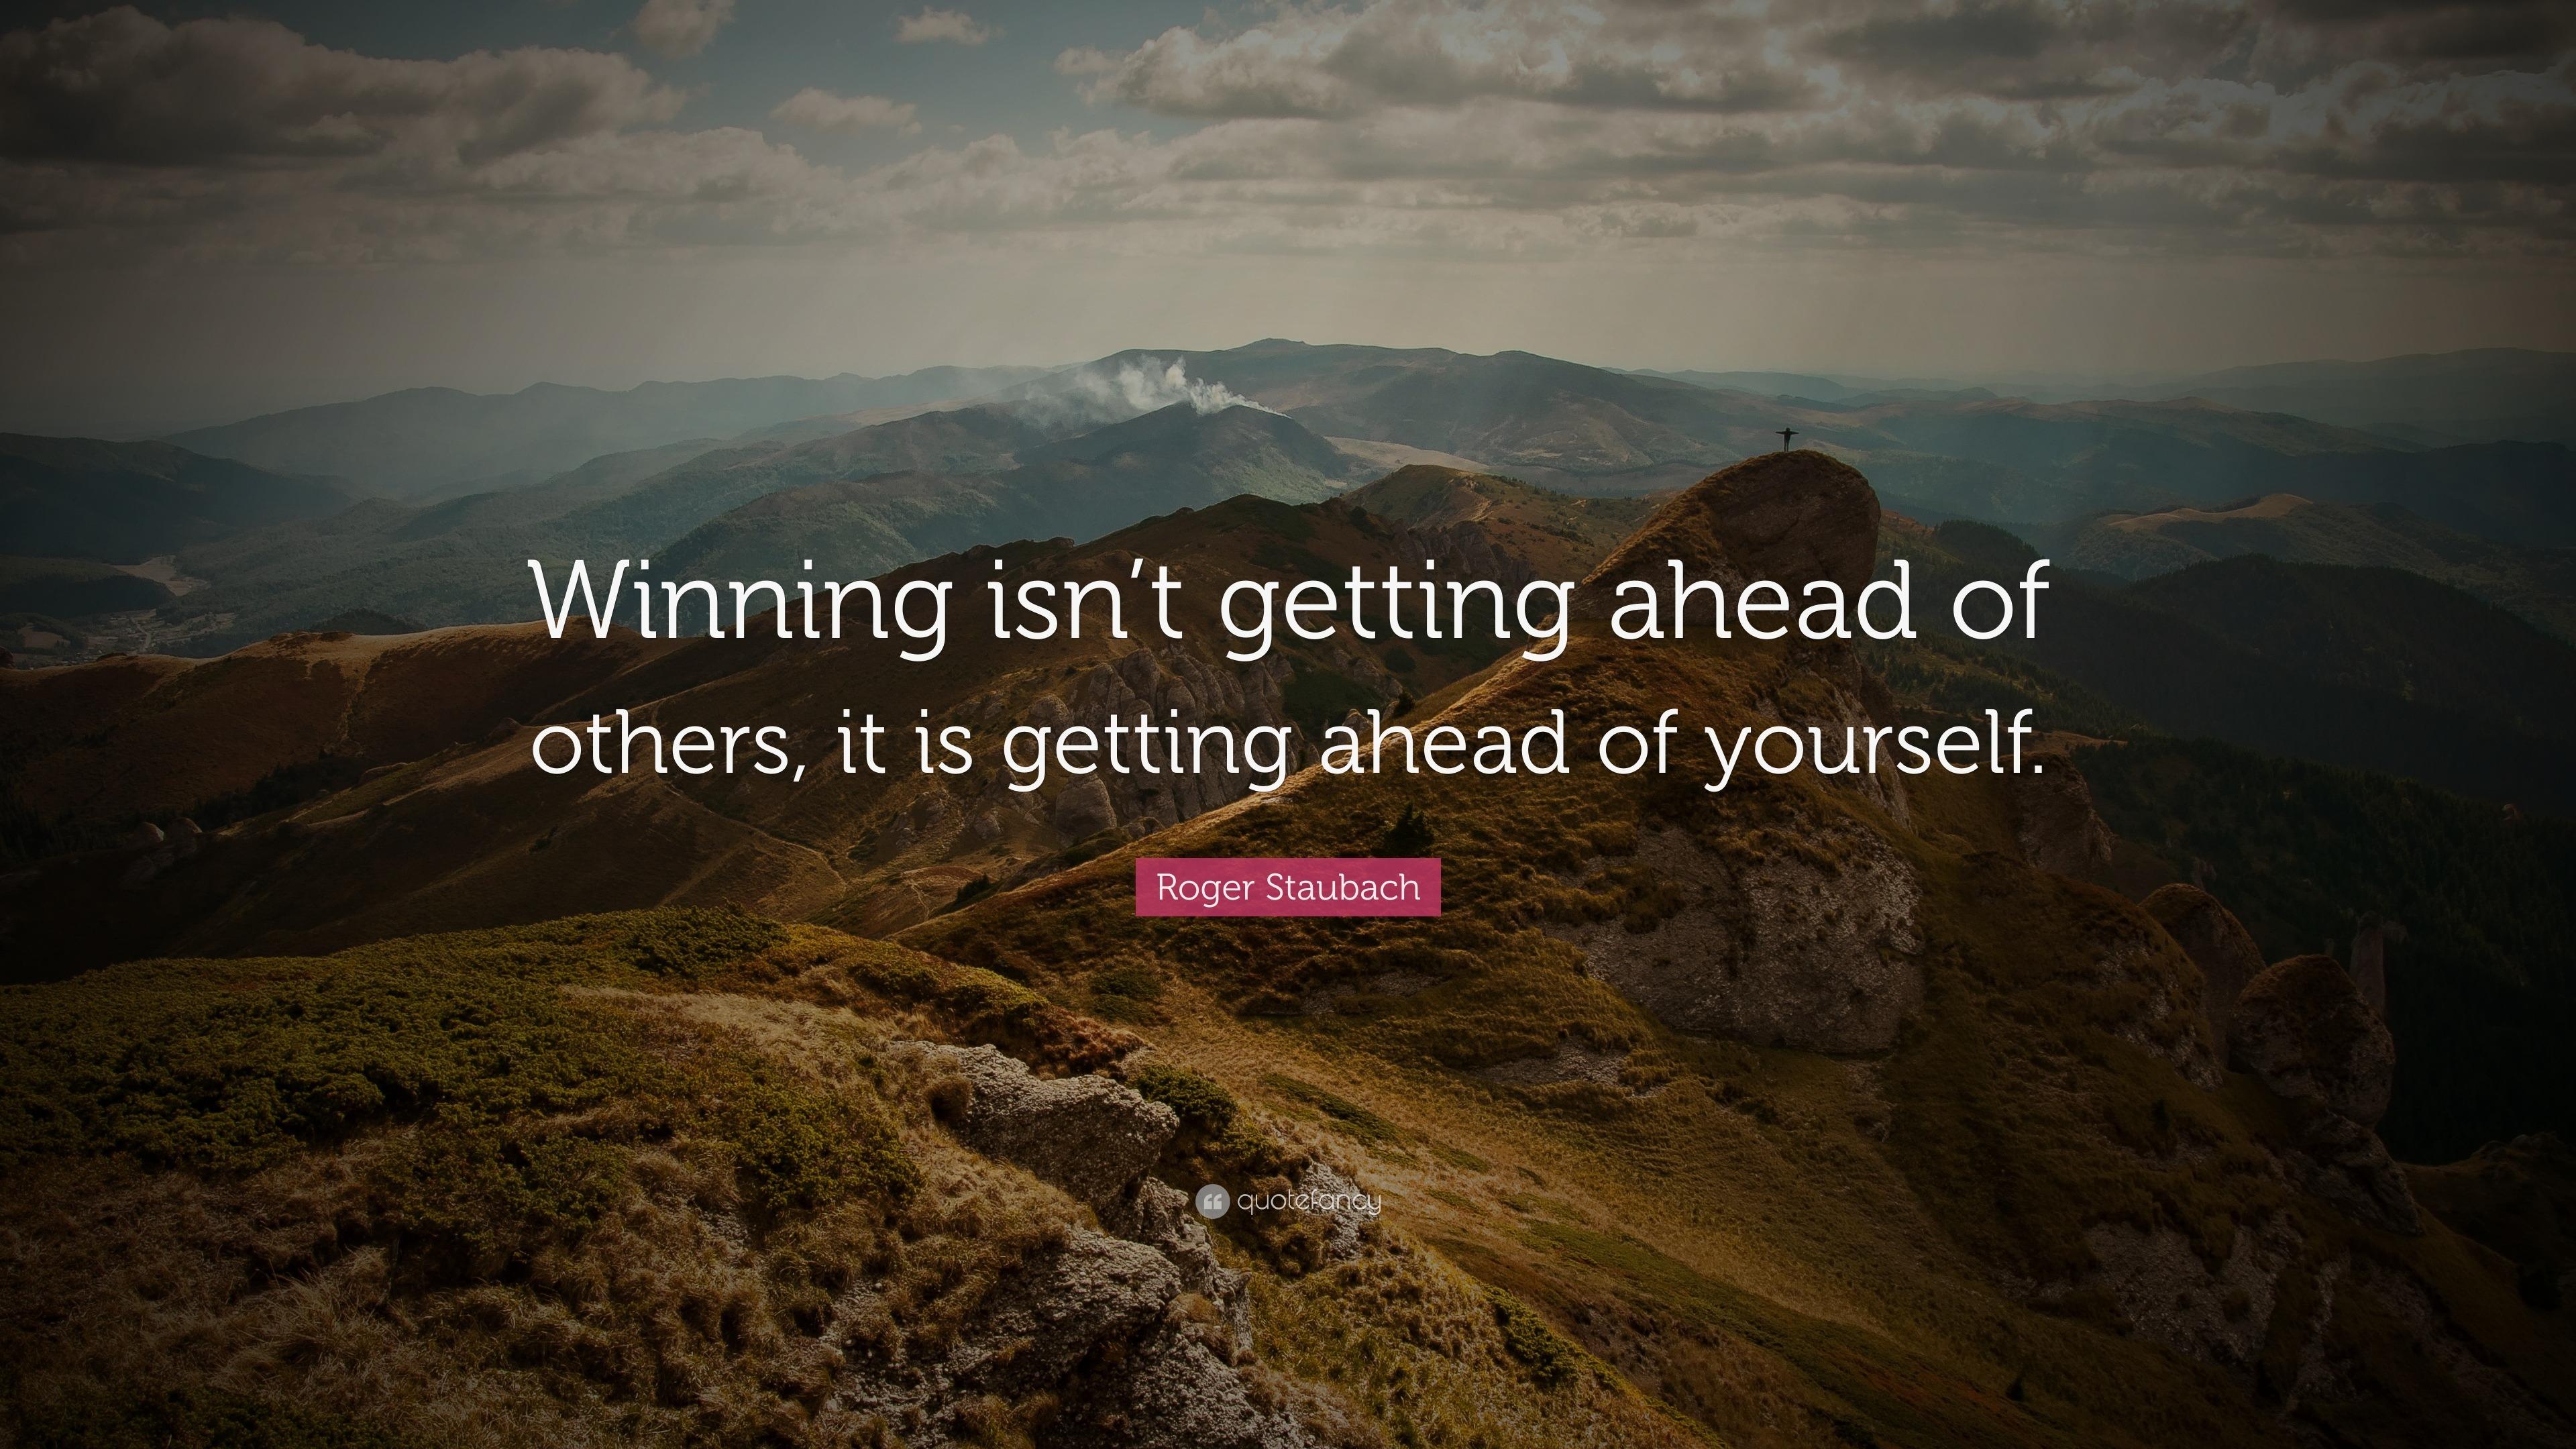 Winning company quotes